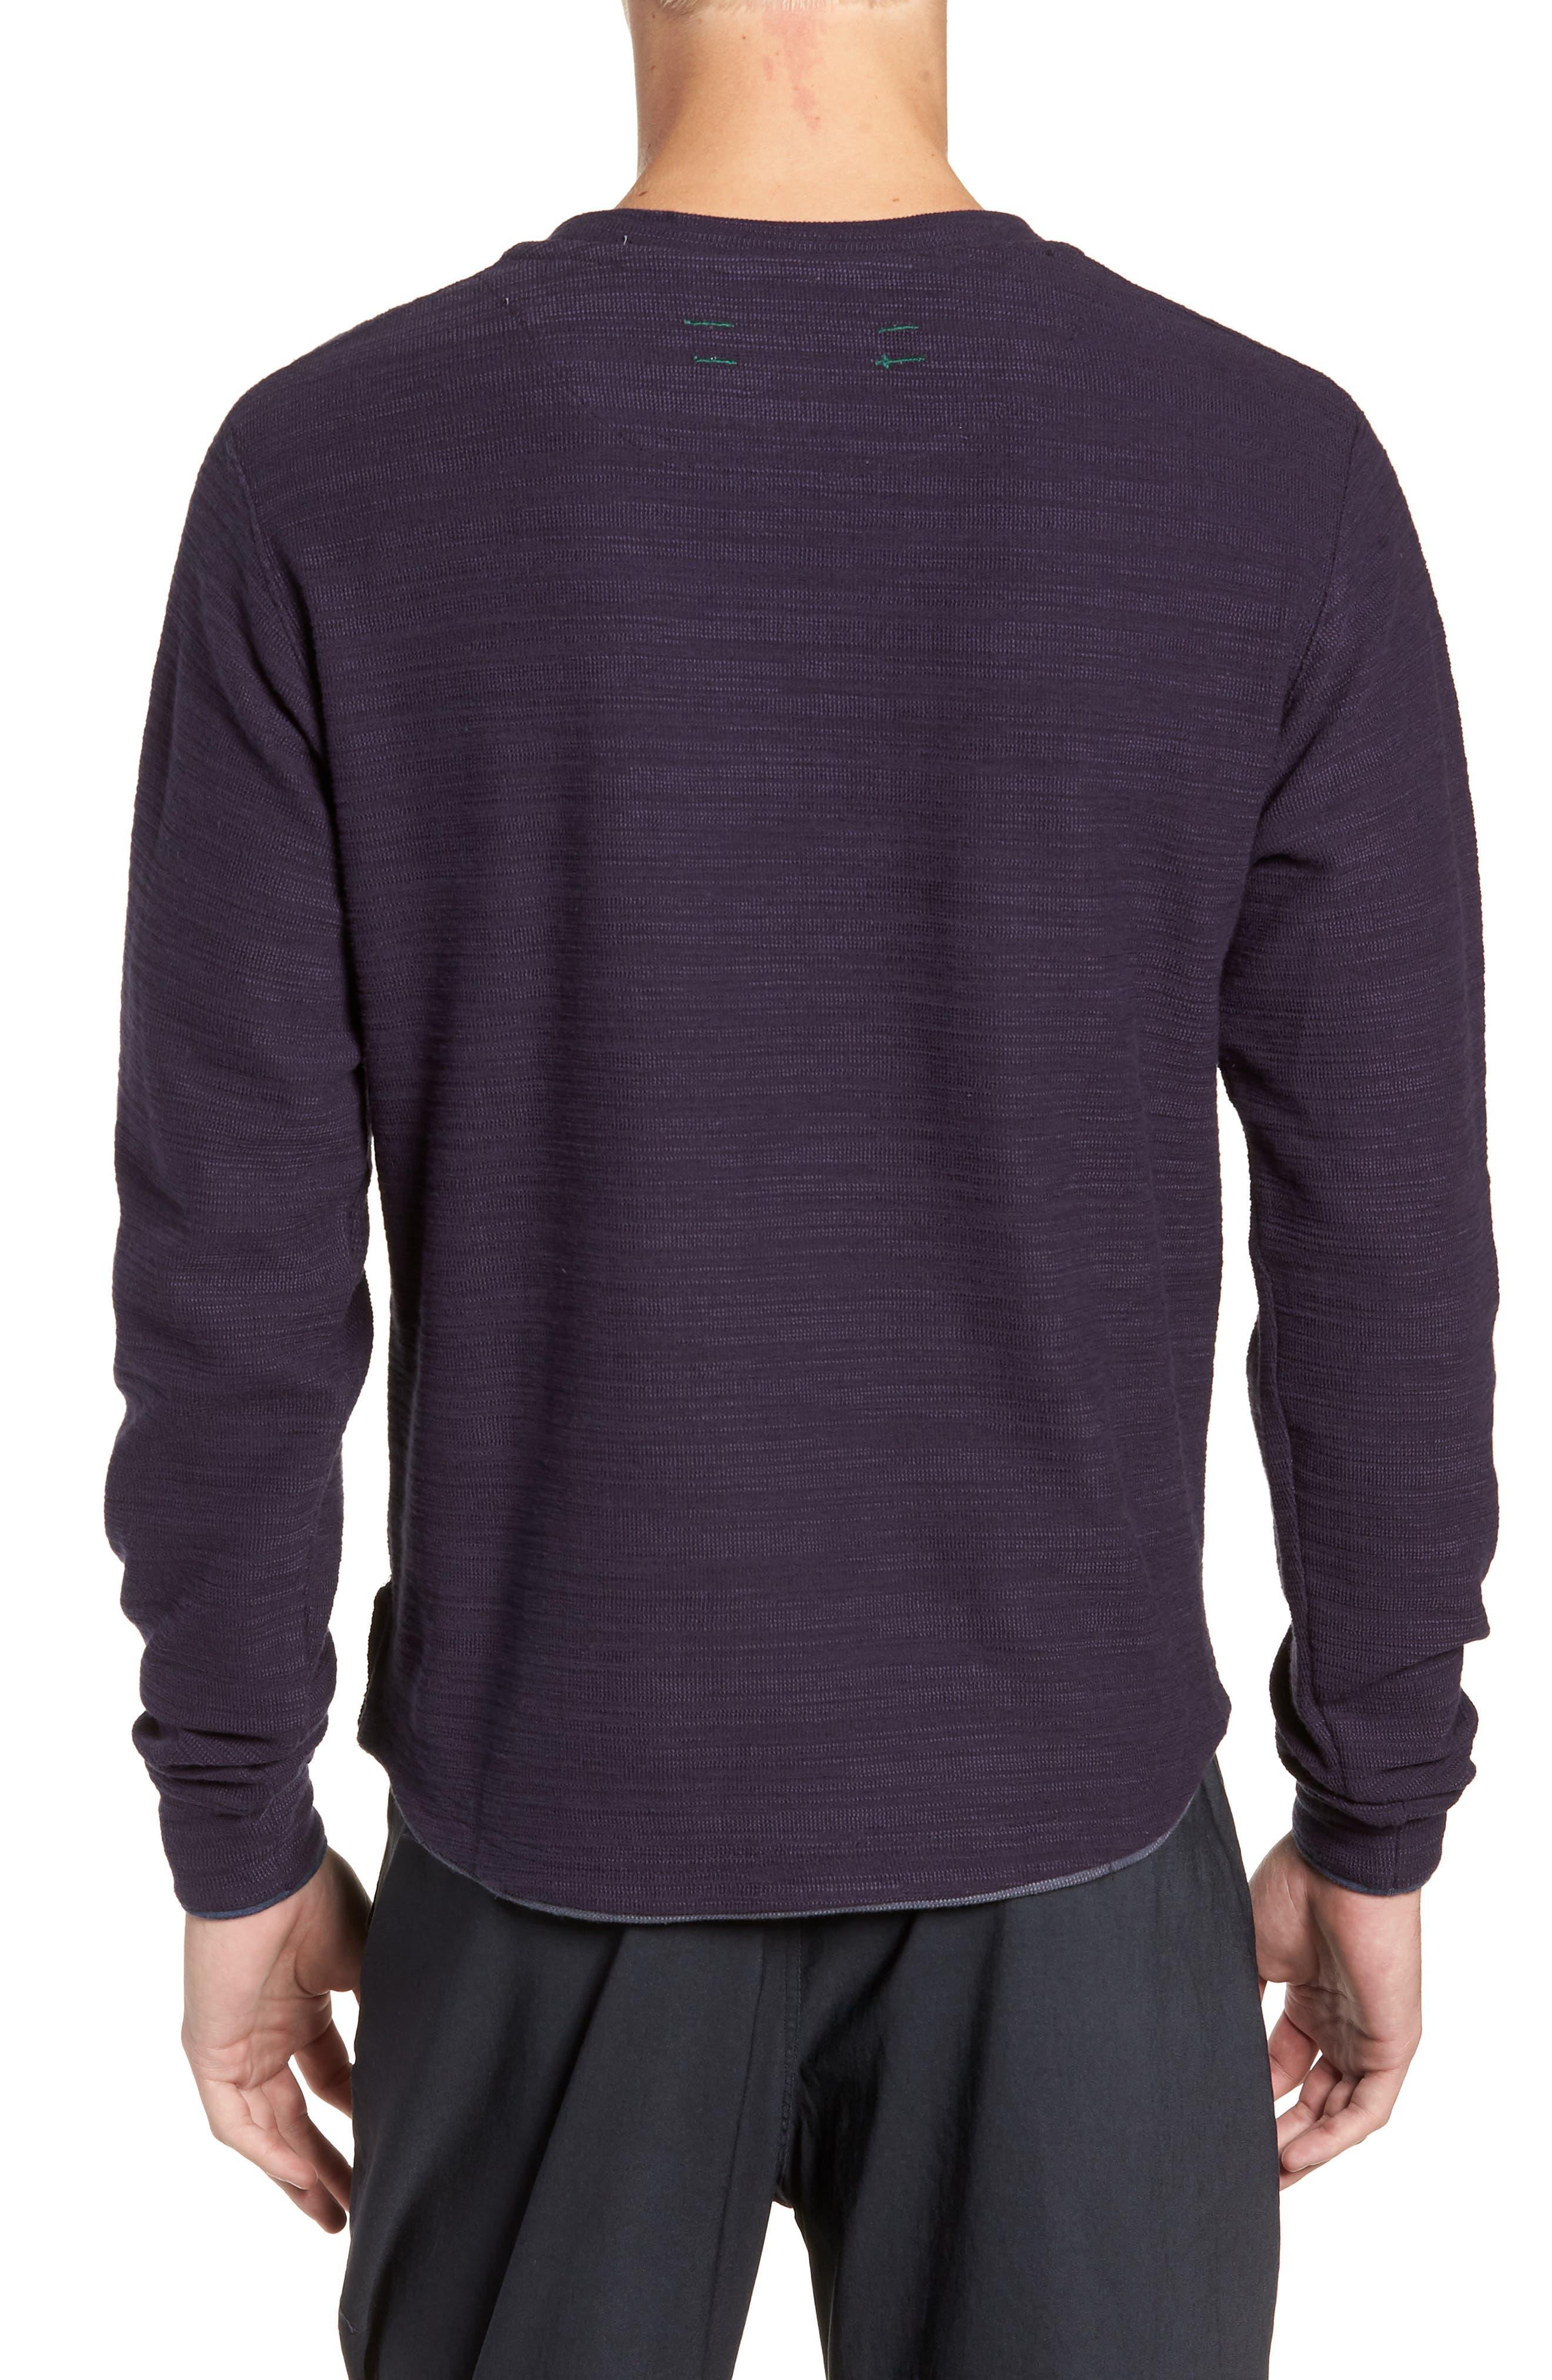 250 Loft Slubbed Crewneck Sweater,                             Alternate thumbnail 2, color,                             NAVY